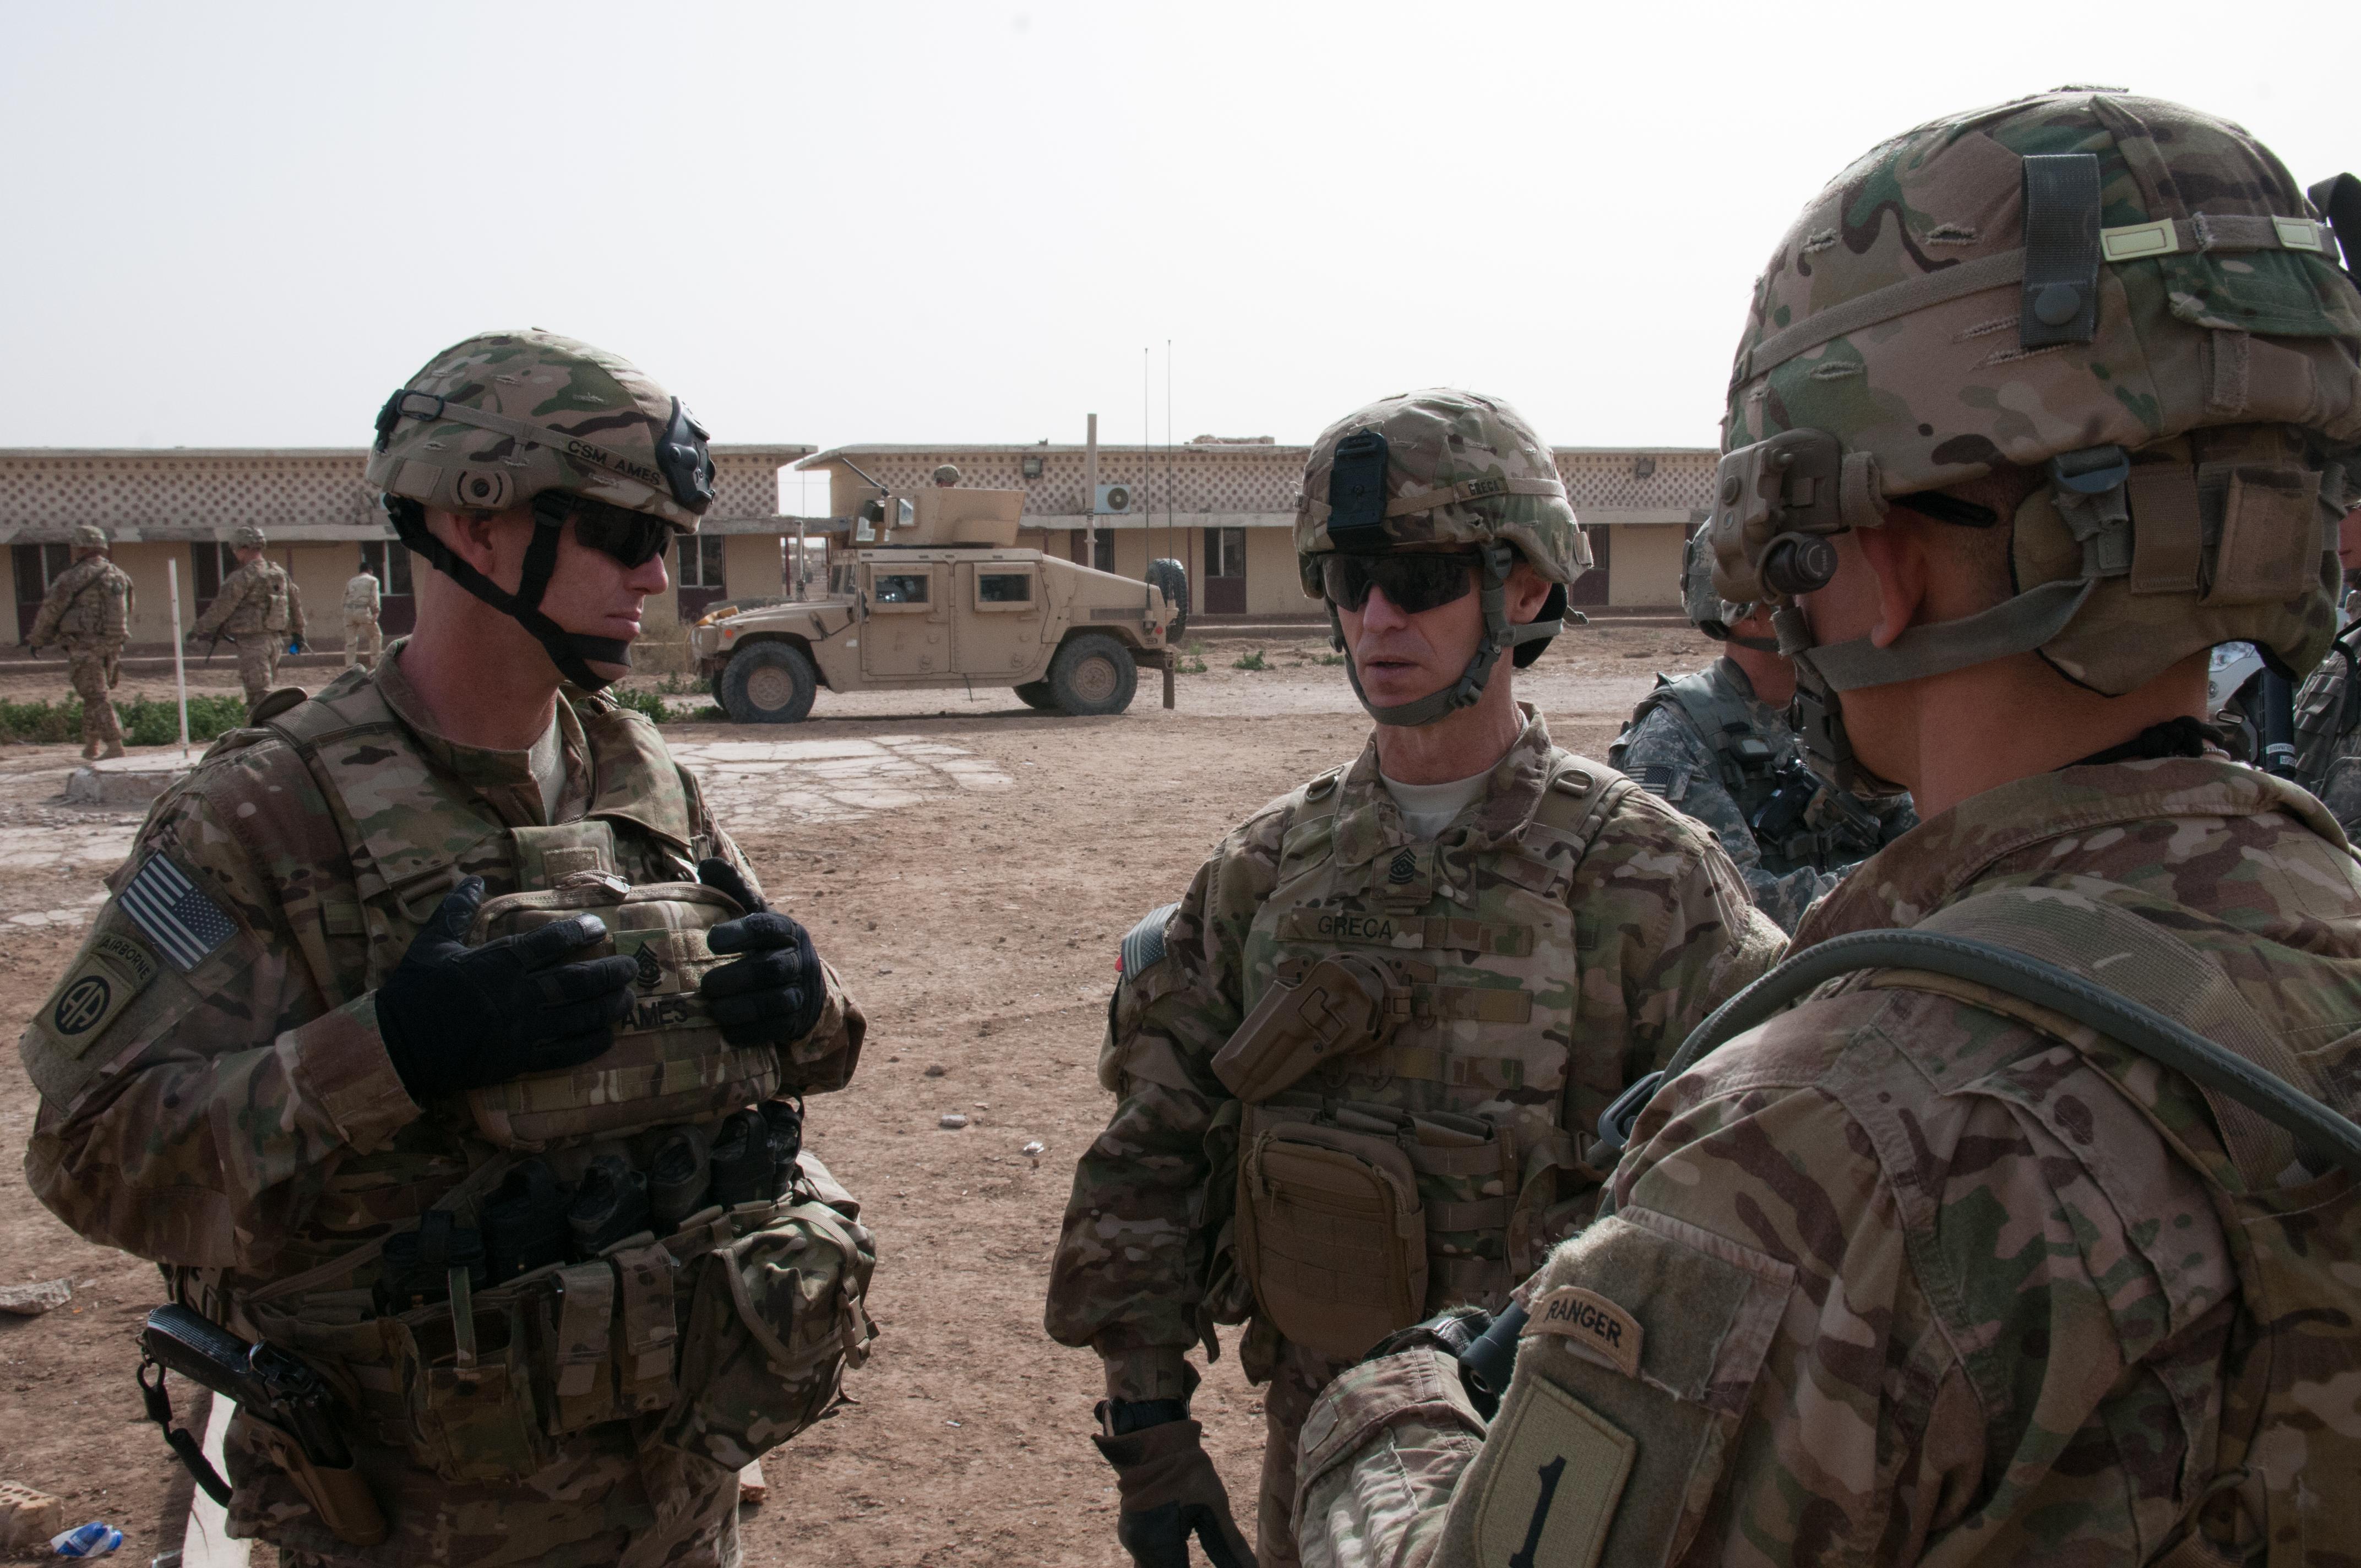 Command Sgt. Maj. Christopher K. Greca